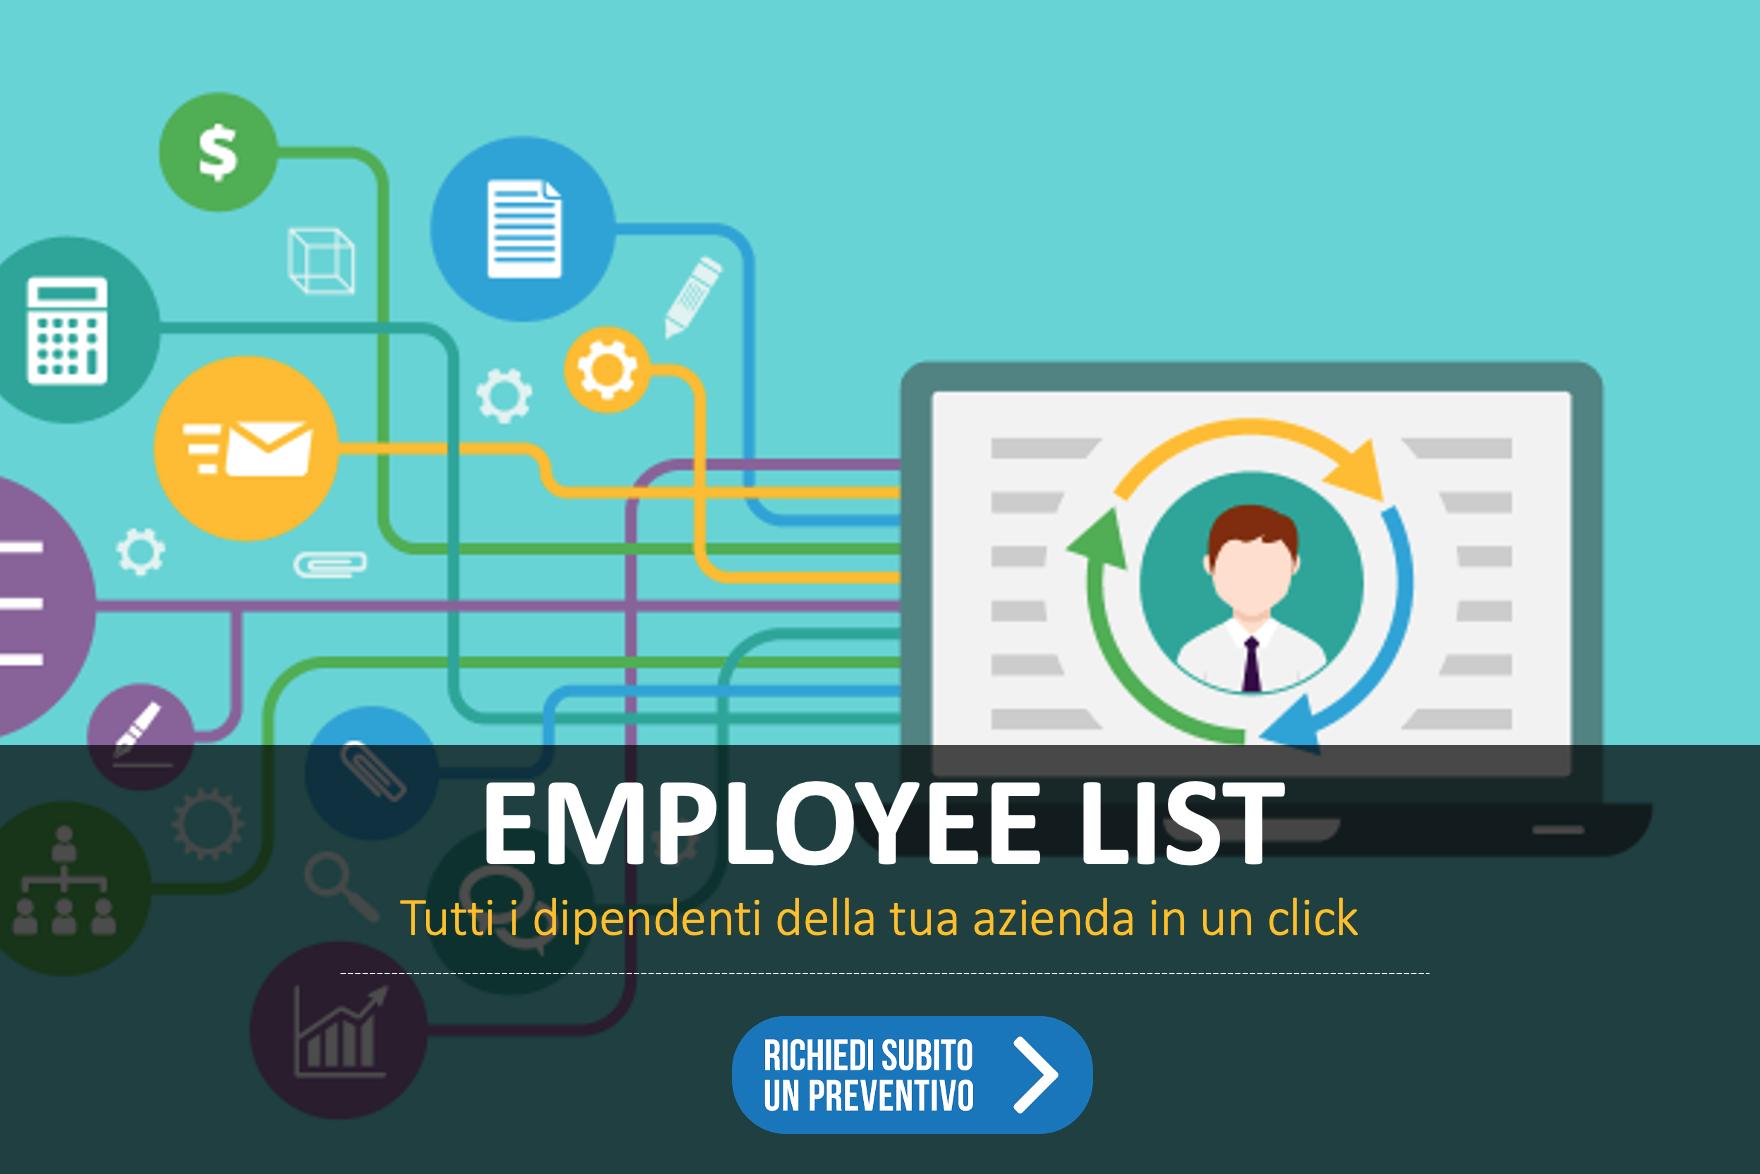 39 Employee List